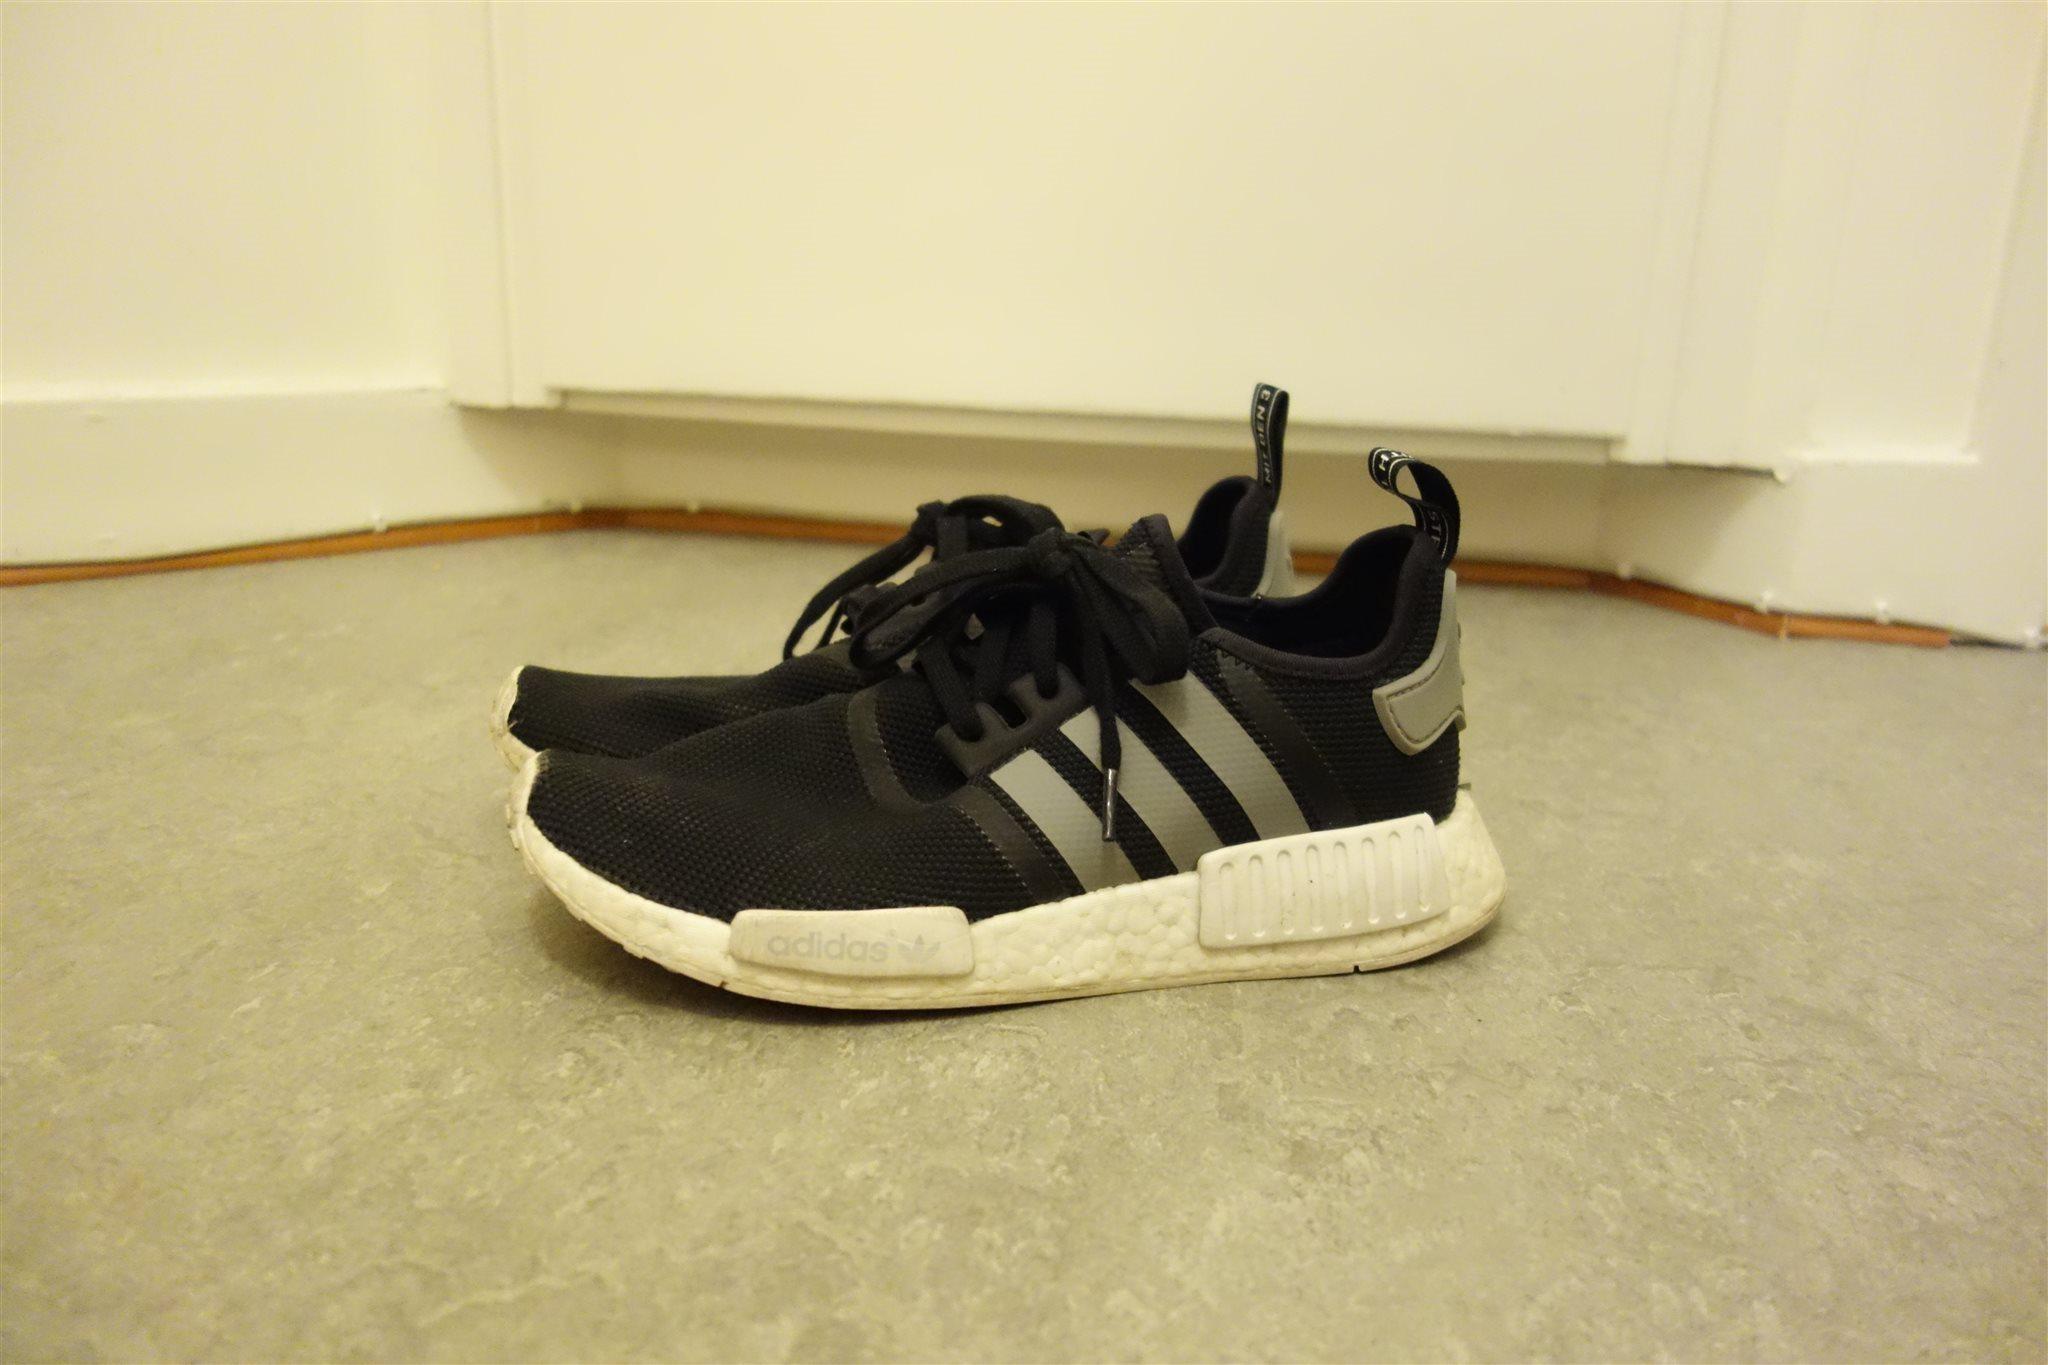 sports shoes e6d61 692bb adidas nmd skor svart strl 42 2 3